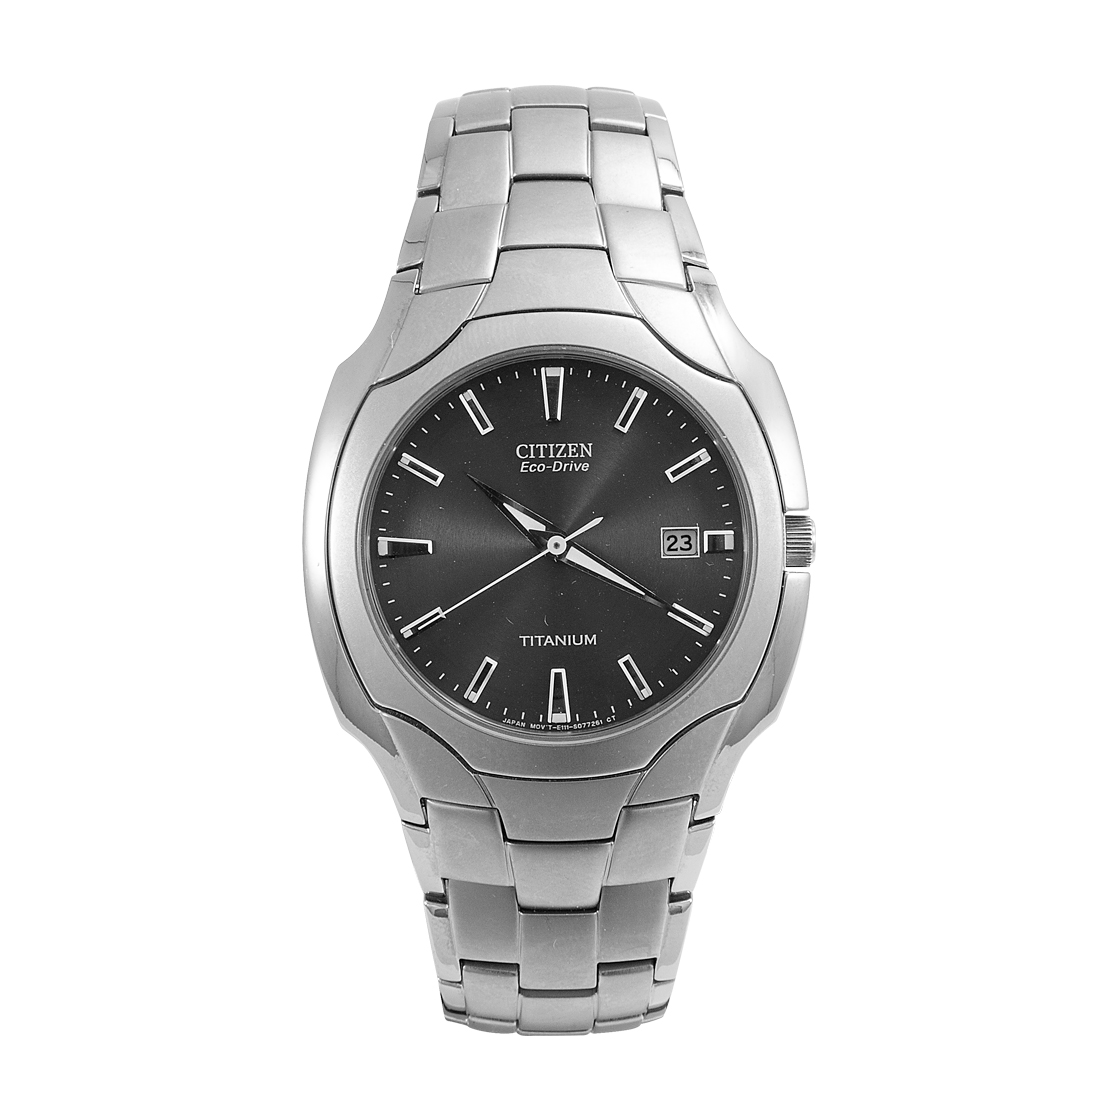 Citizen Men's Titanium Watch